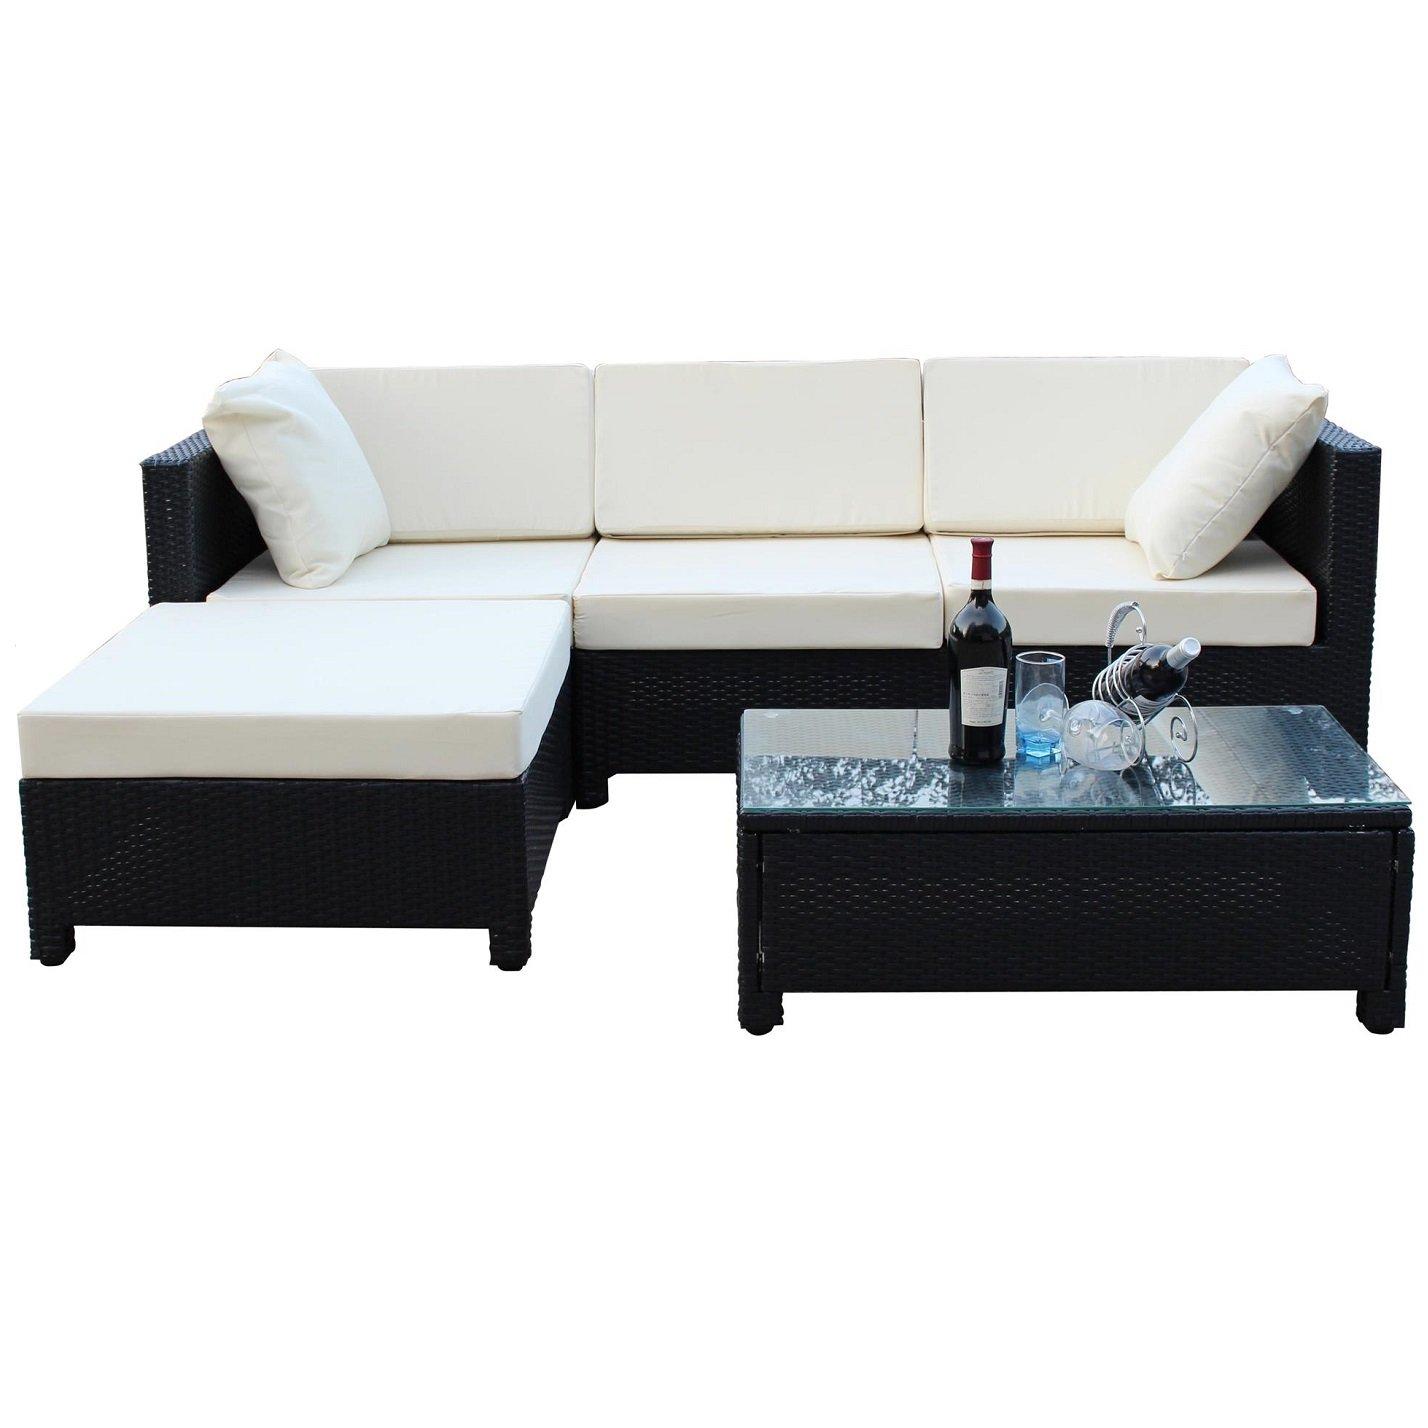 Evre Rattan Outdoor Garden Furniture Coffee Table Sofa Chair Set